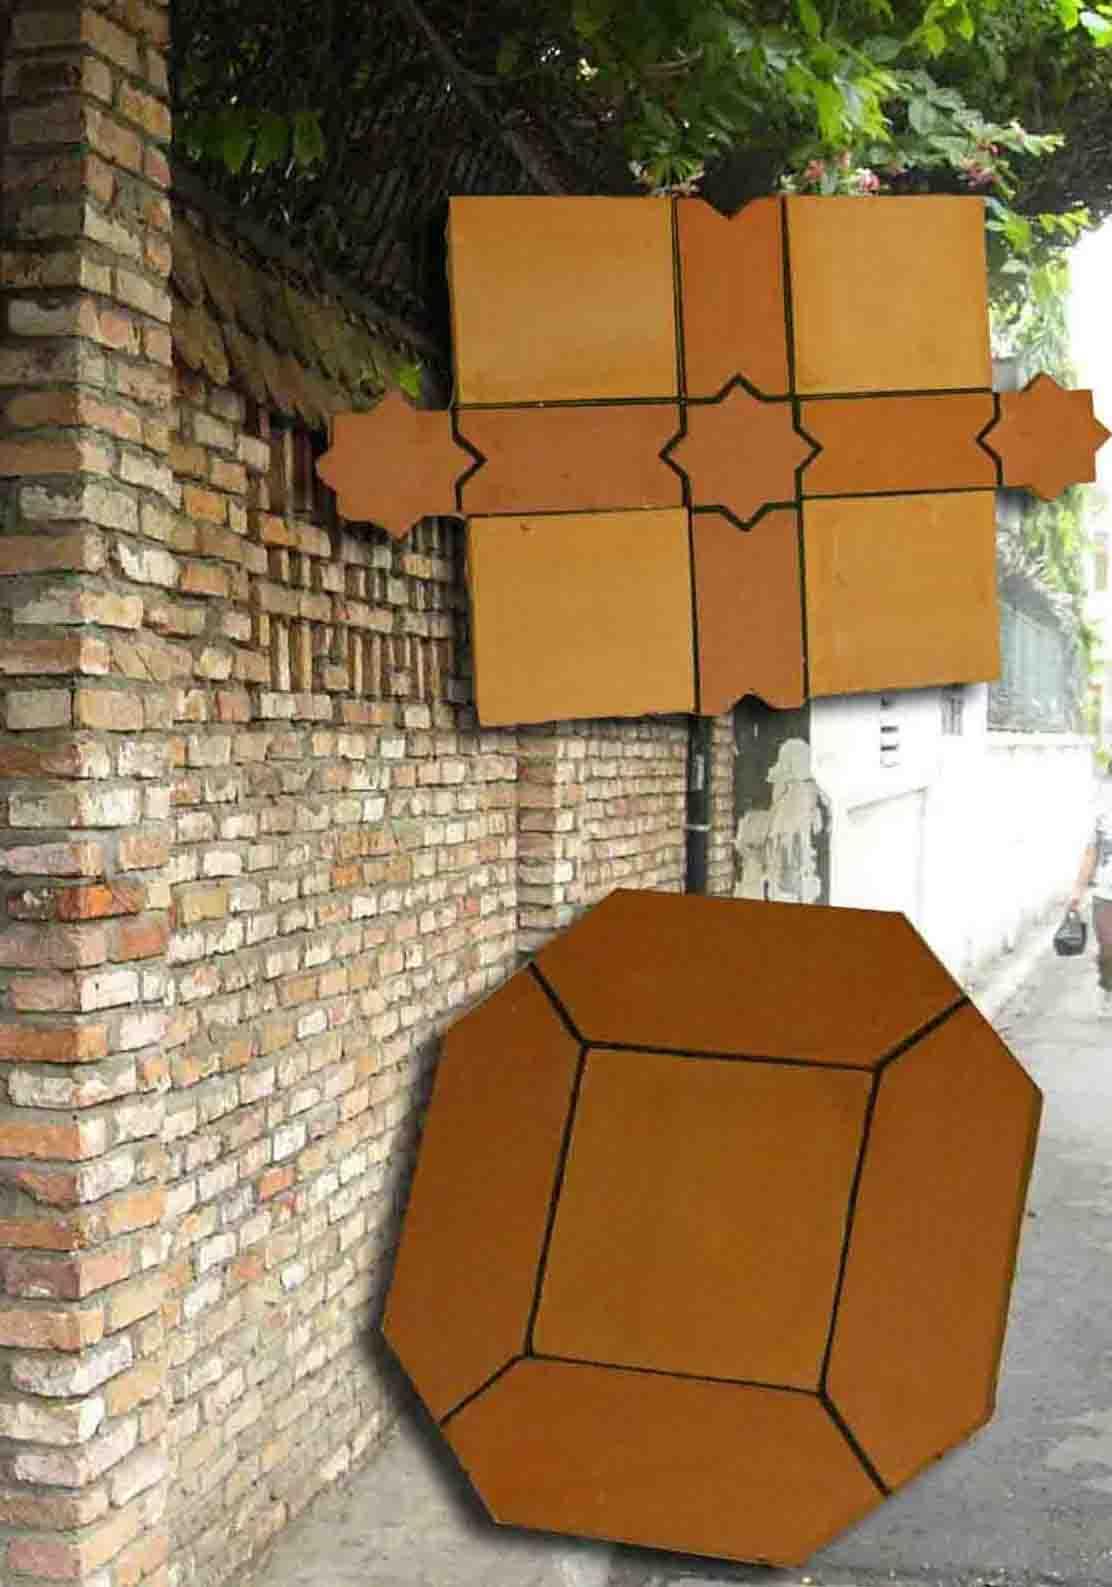 Terracotta Deco Clay Block (Терракотовая Deco глины,)